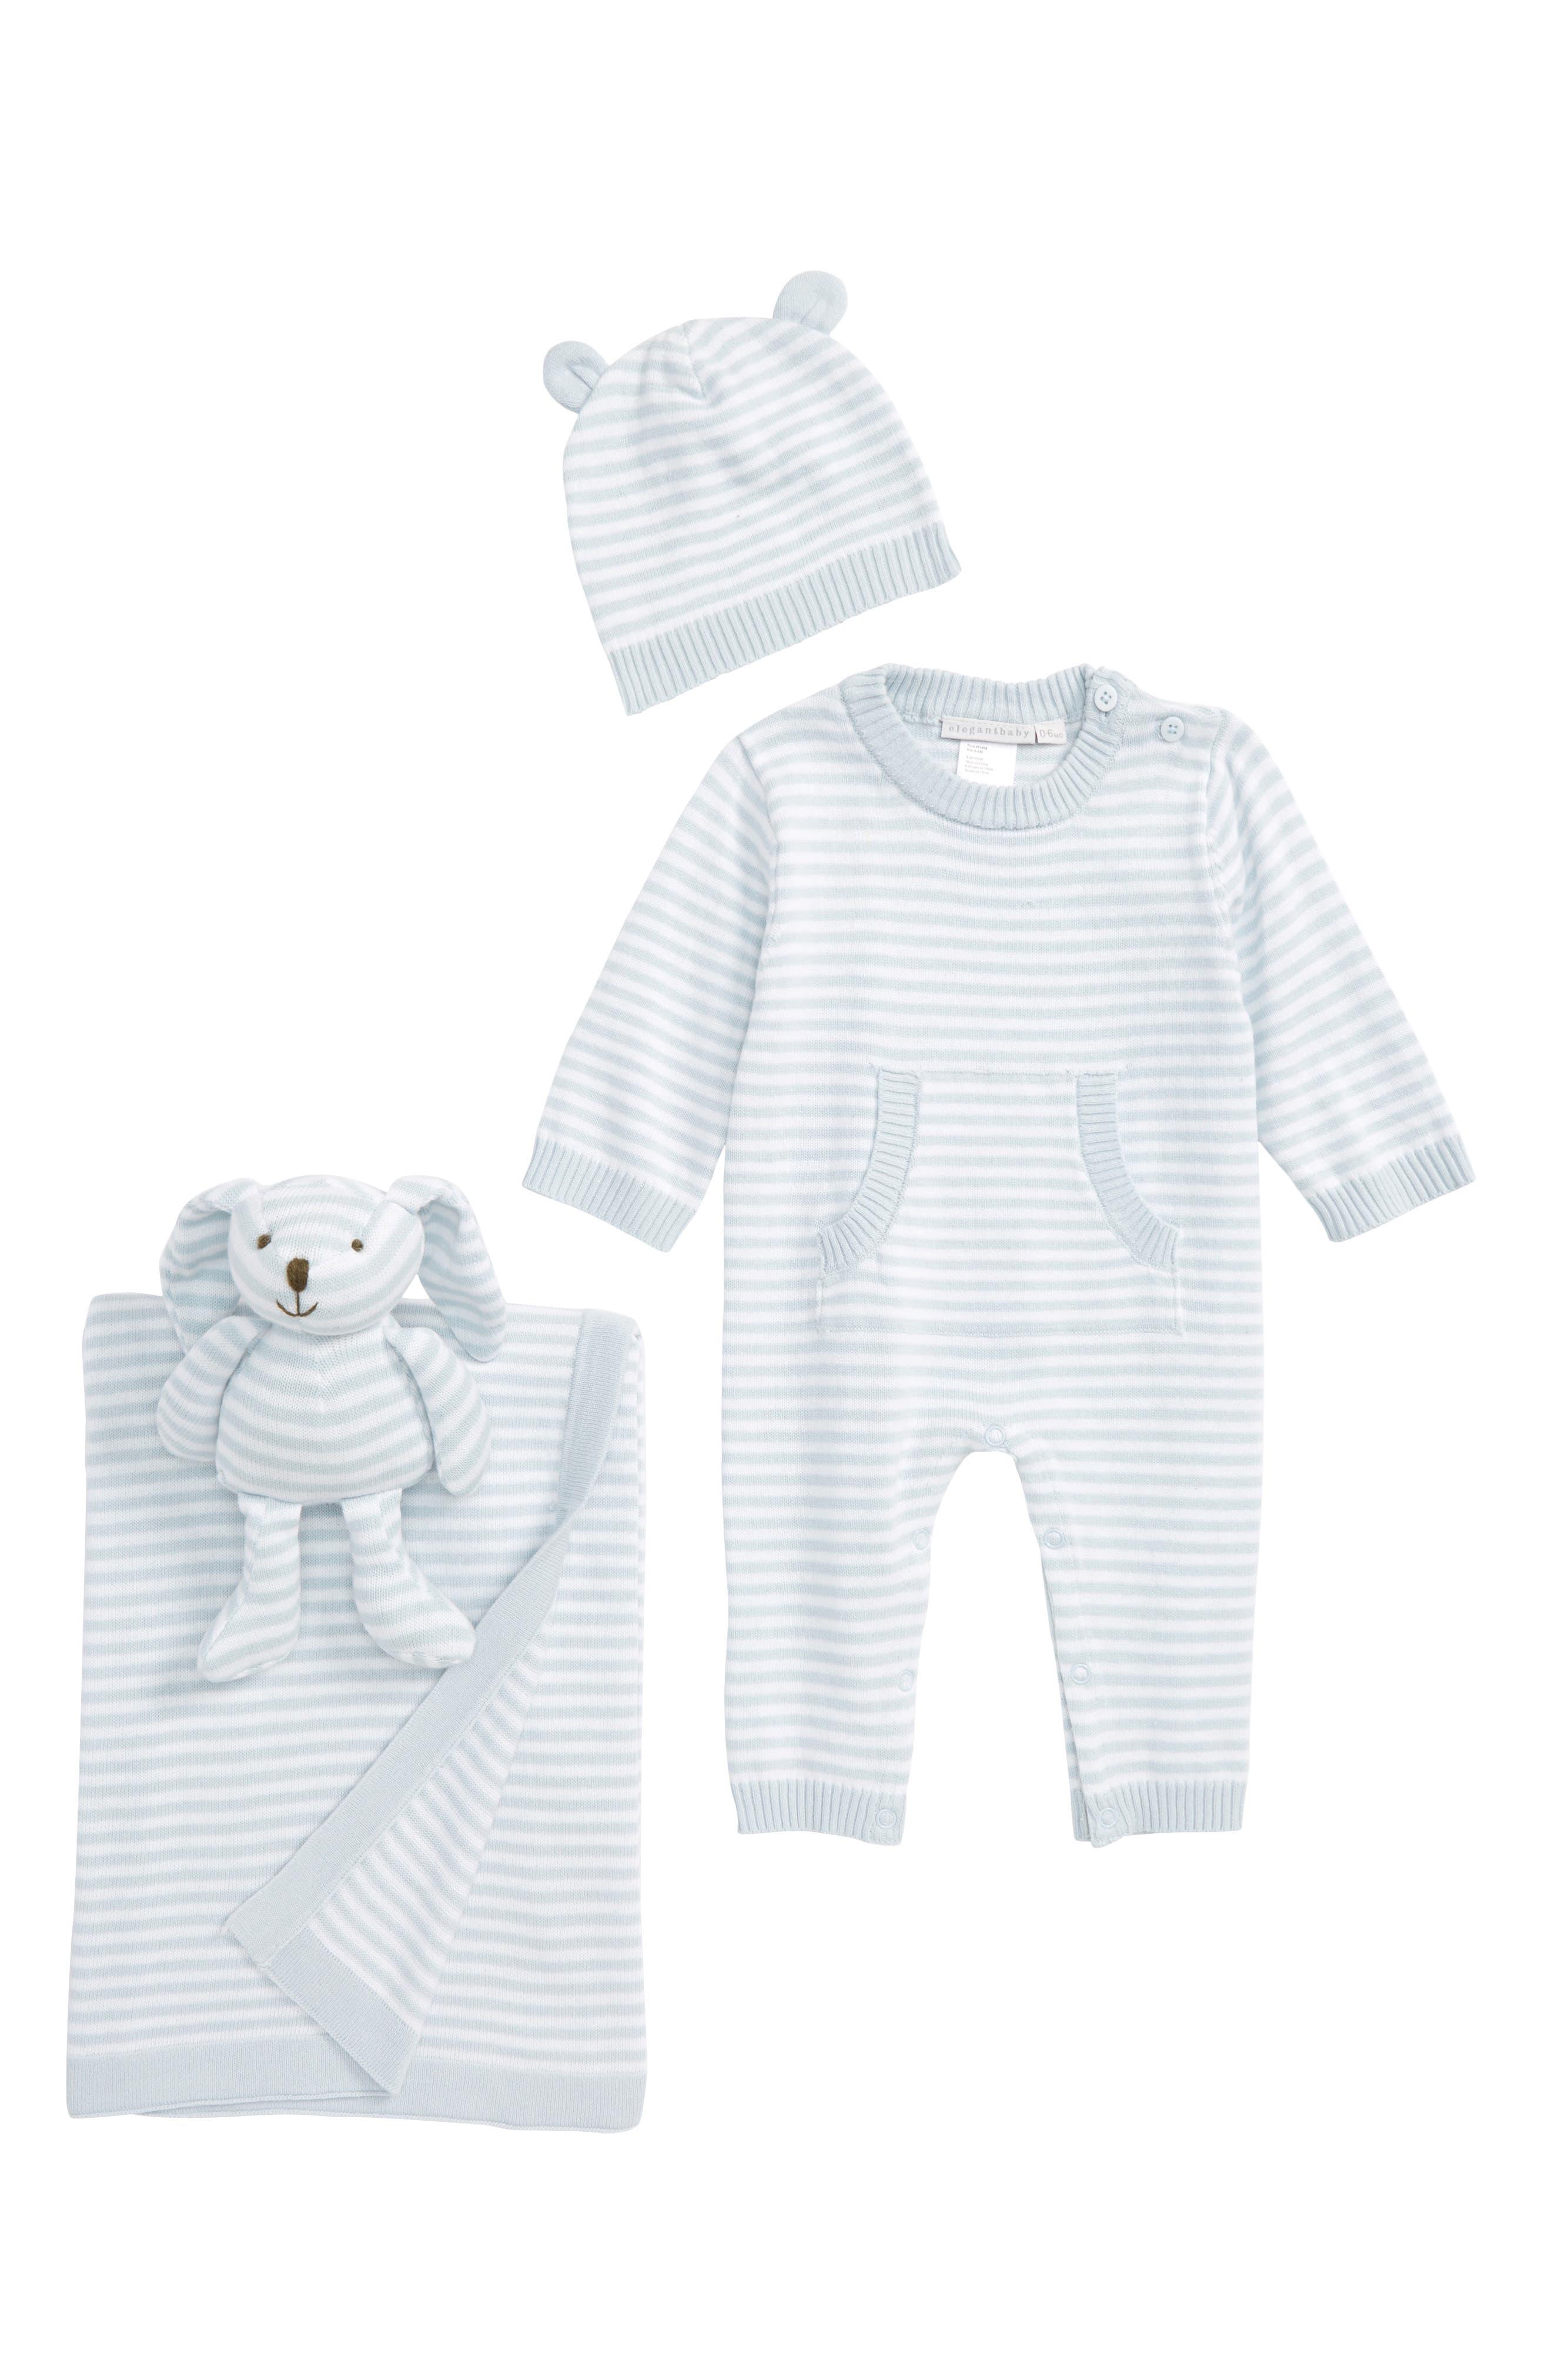 ELEGANT BABY Bunny Romper, Hat, Blanket & Plush Bunny, Main, color, 450